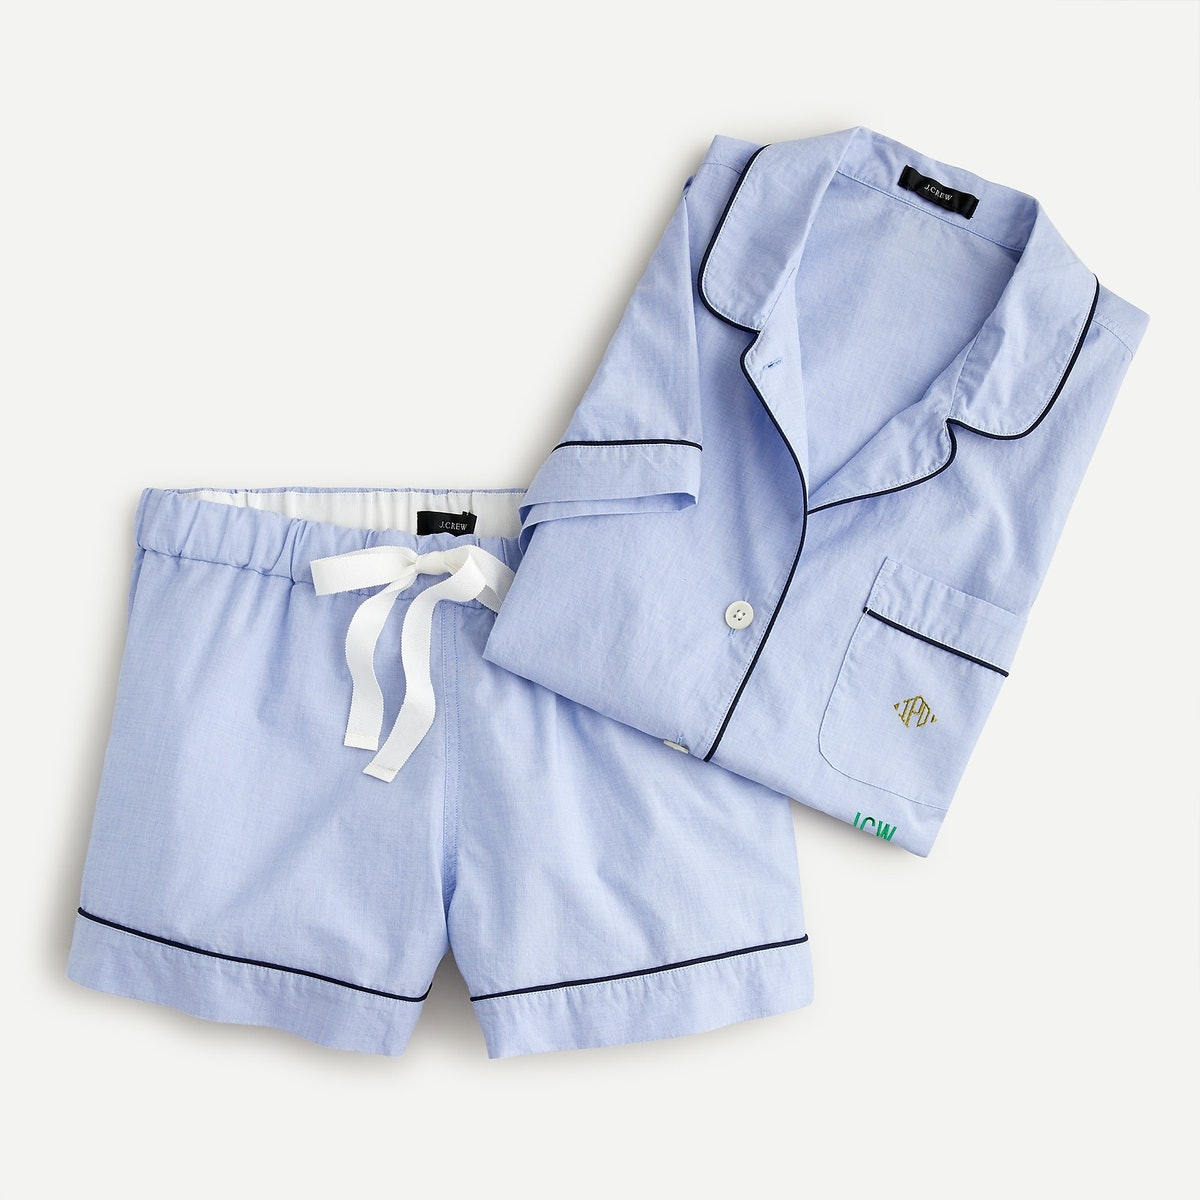 End-On-End Cotton Pajama Shorts Set